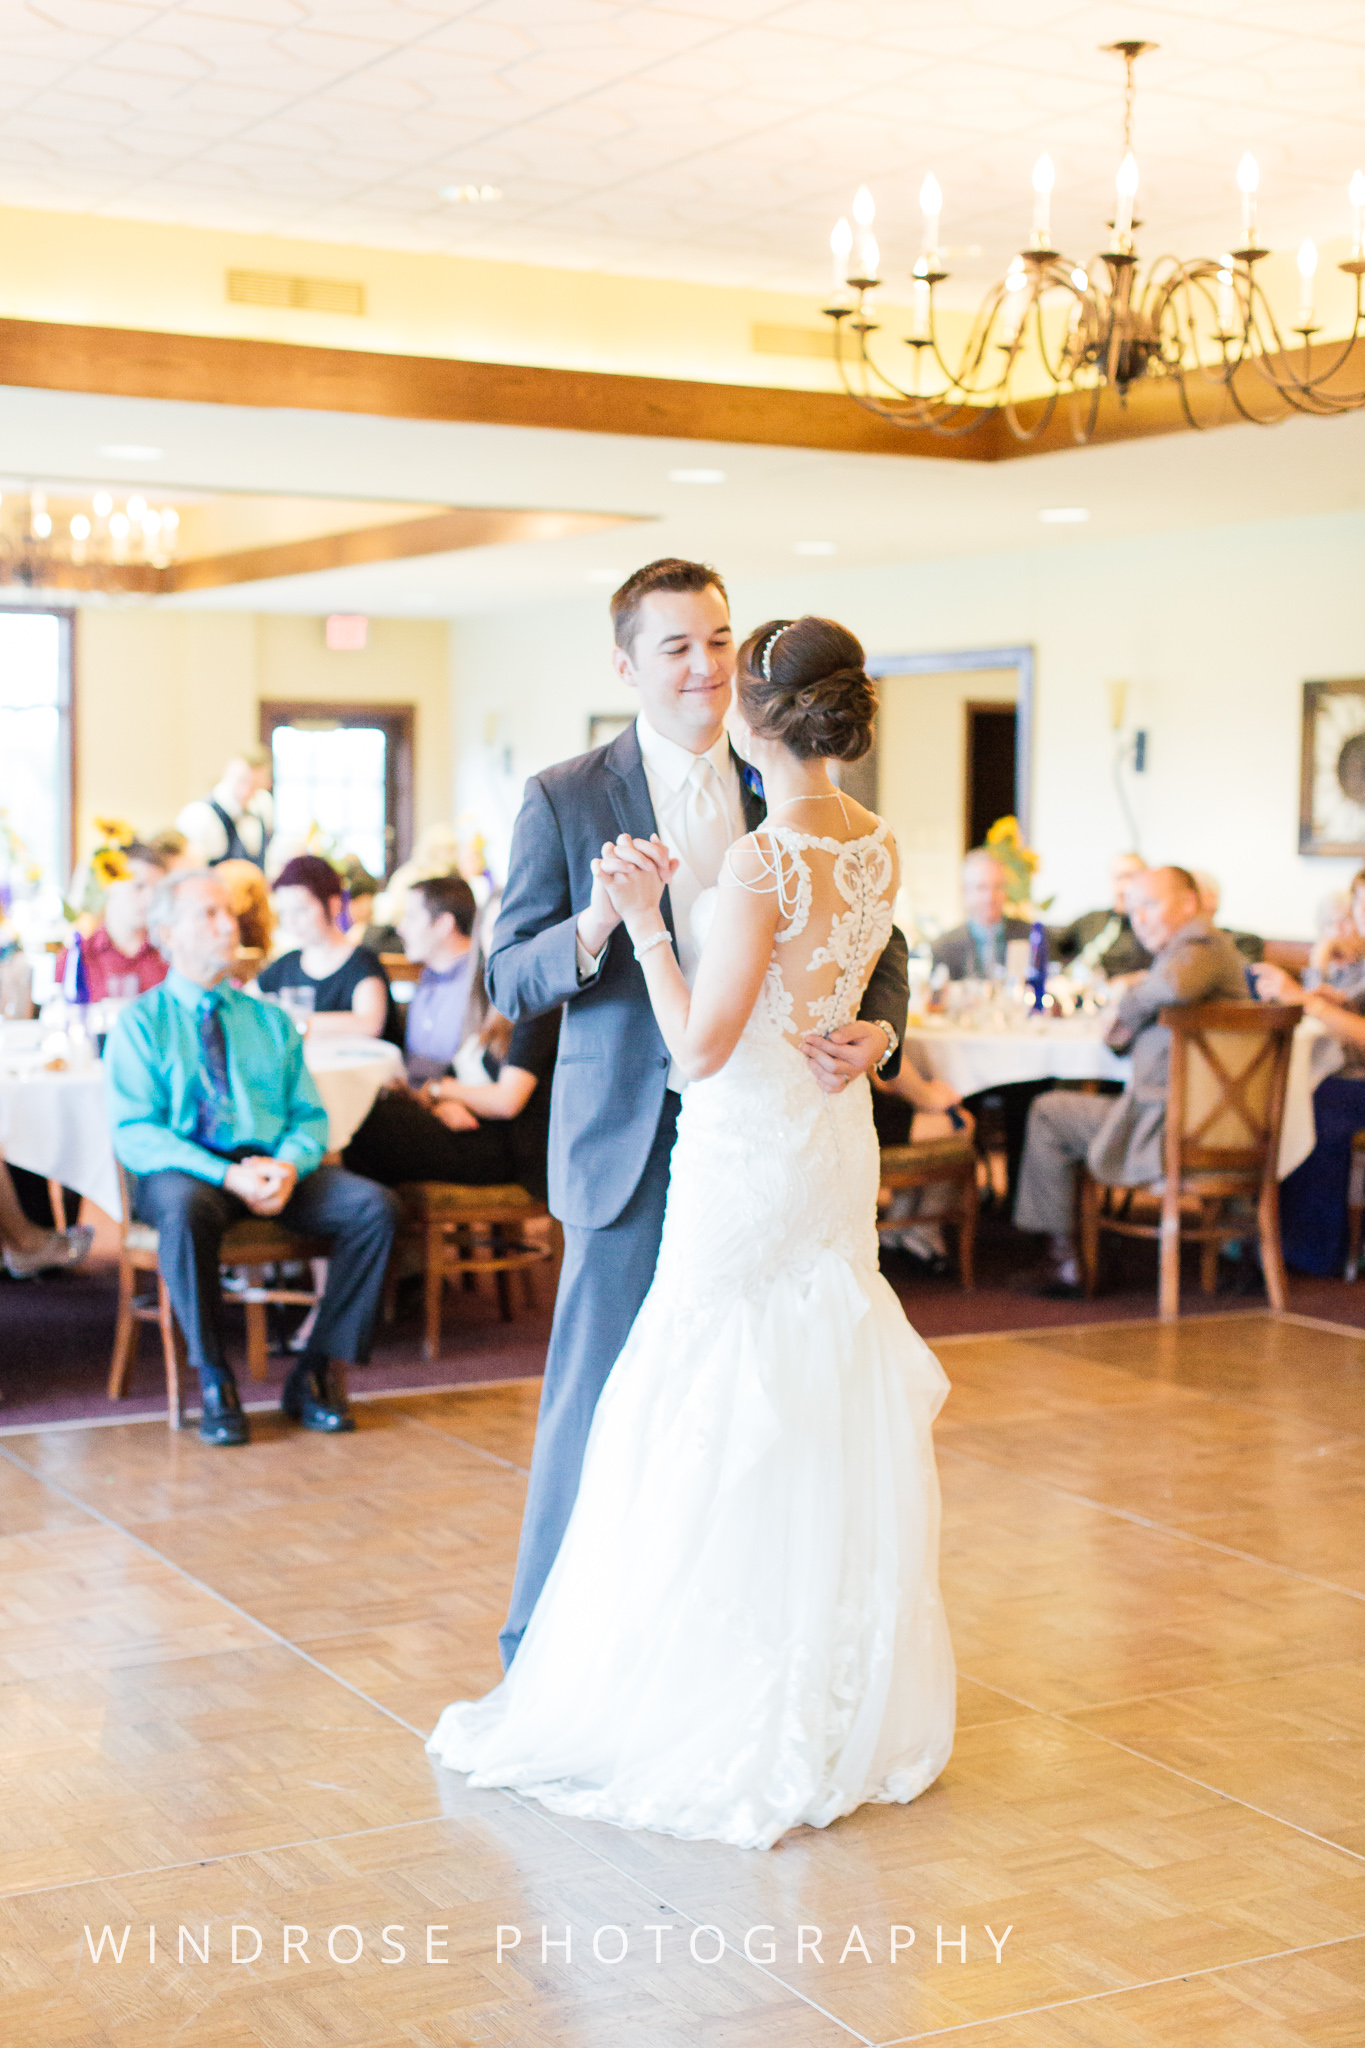 La-Crosse-Country-Club-Wedding-Minnesota-Wedding-Photographer-45.jpg